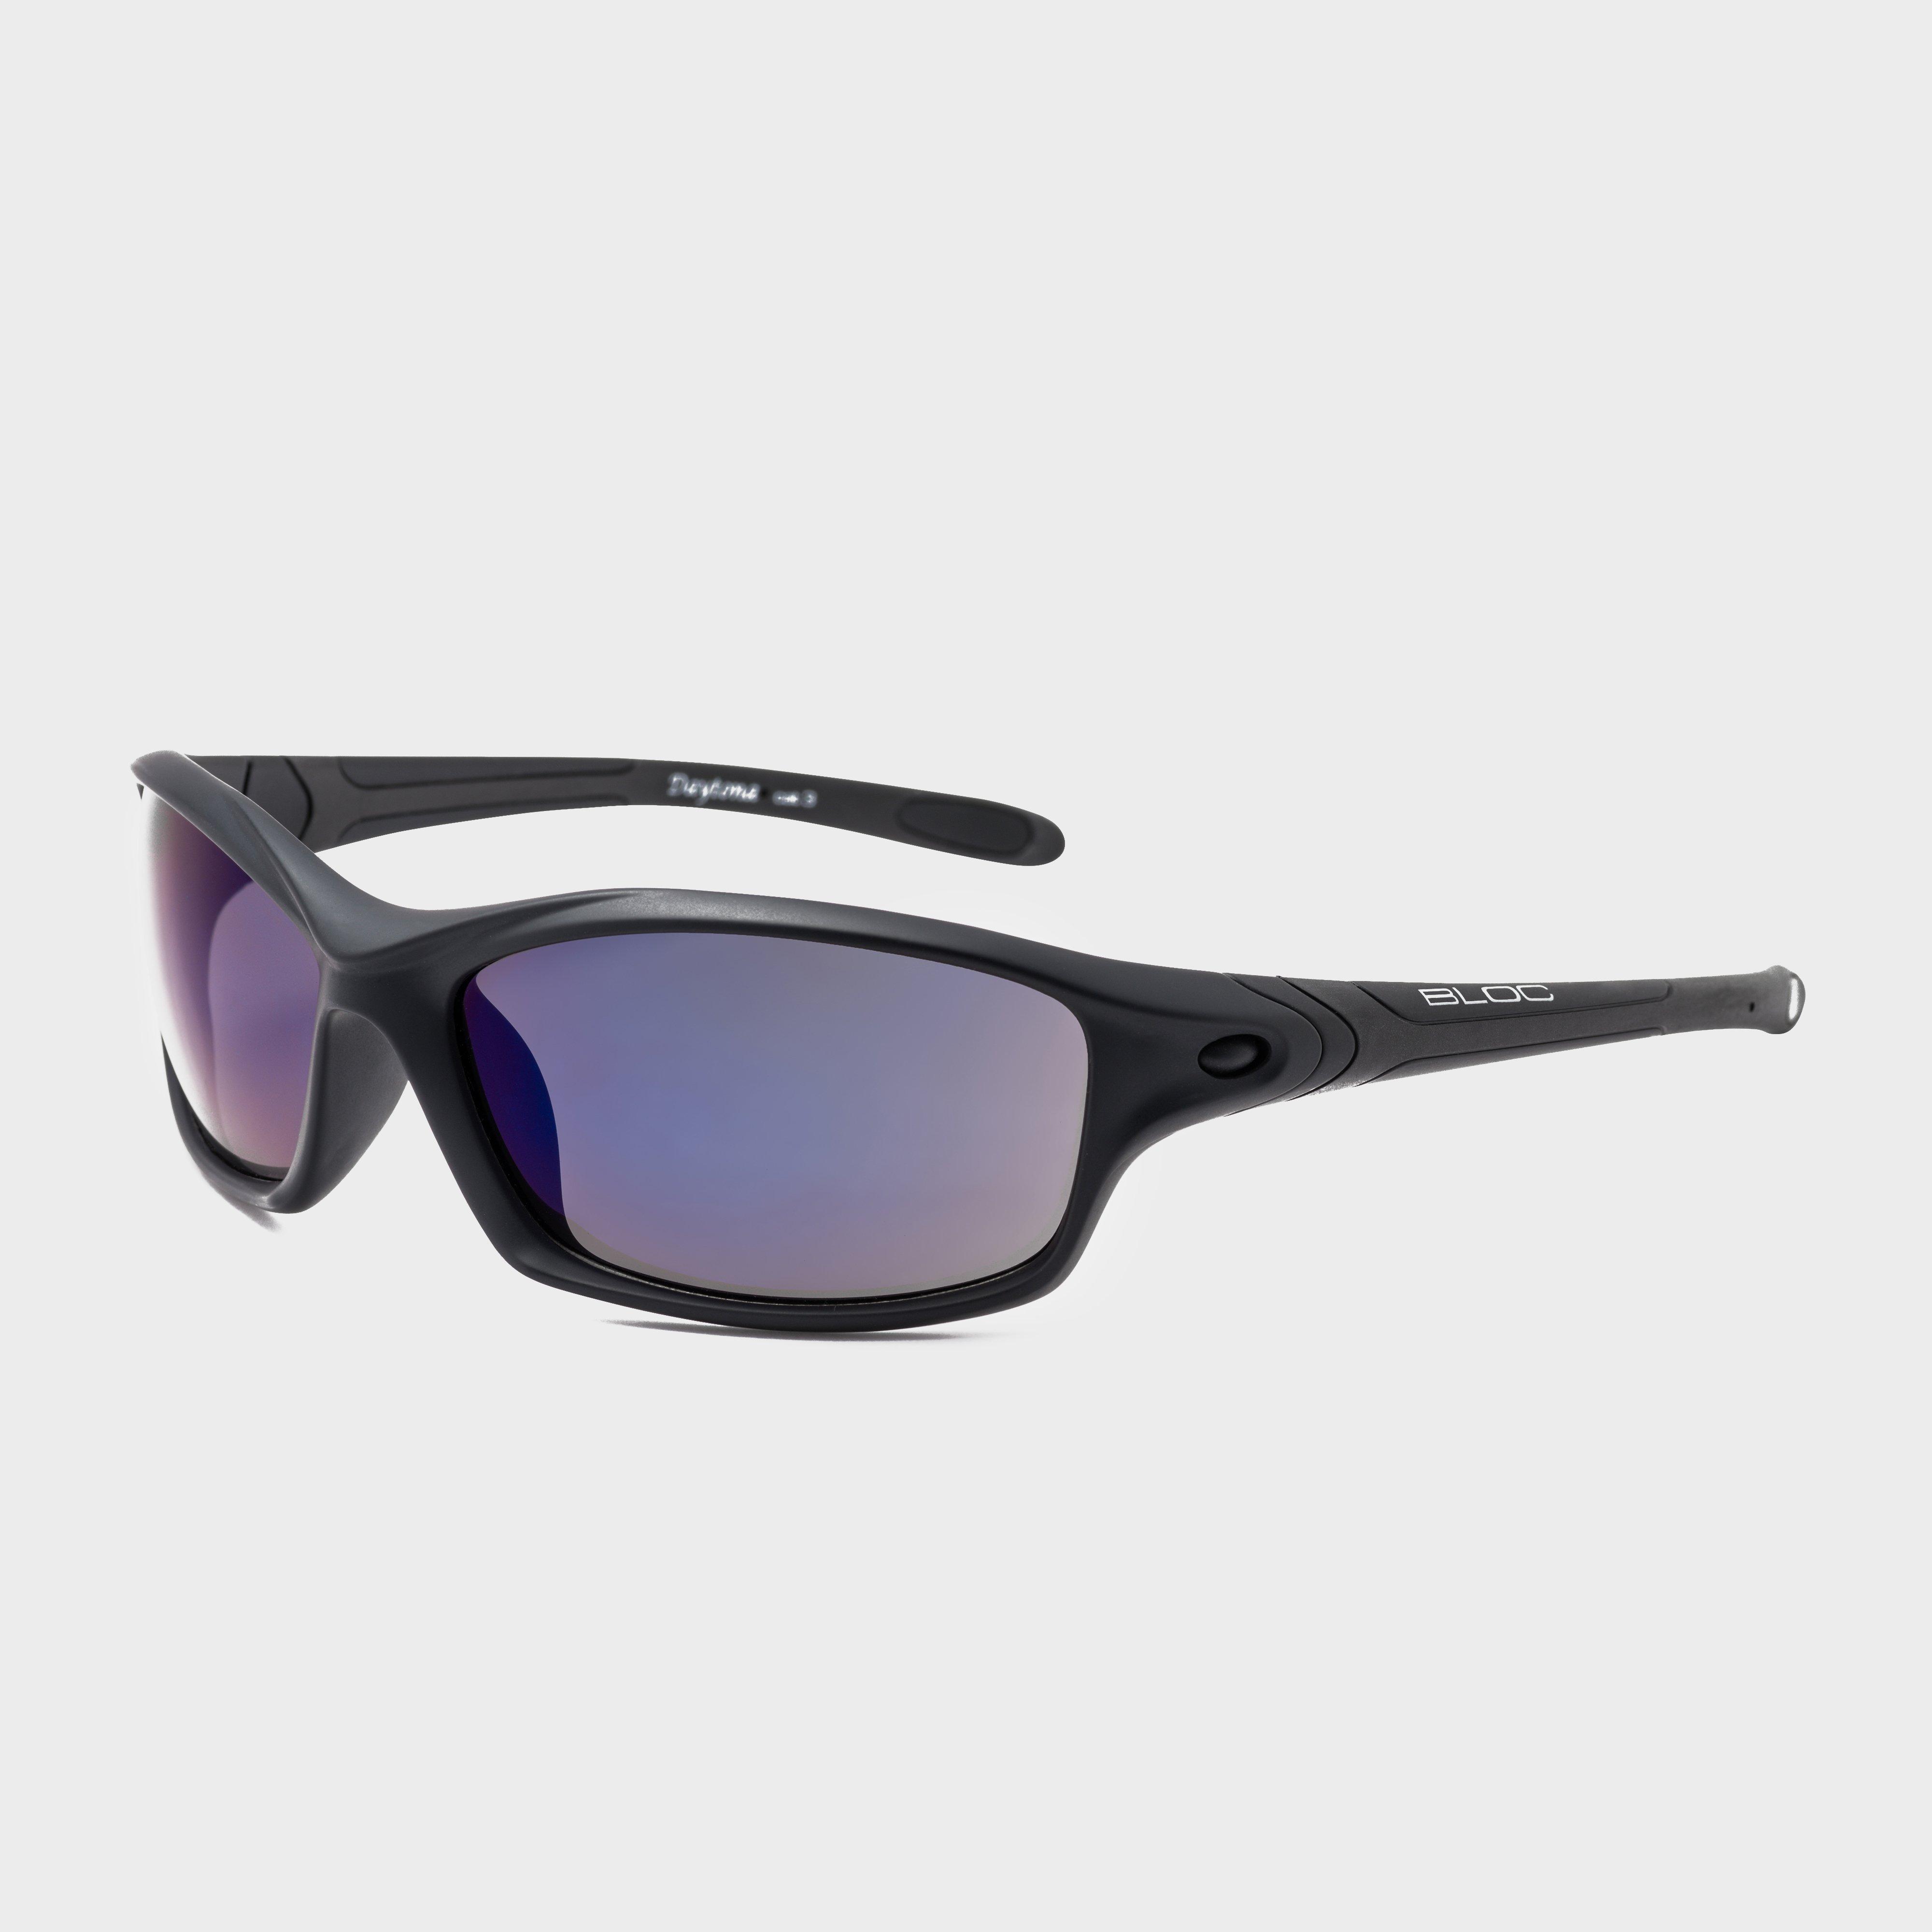 Bloc Bloc Daytona XMB60 Sunglasses - Black, Black